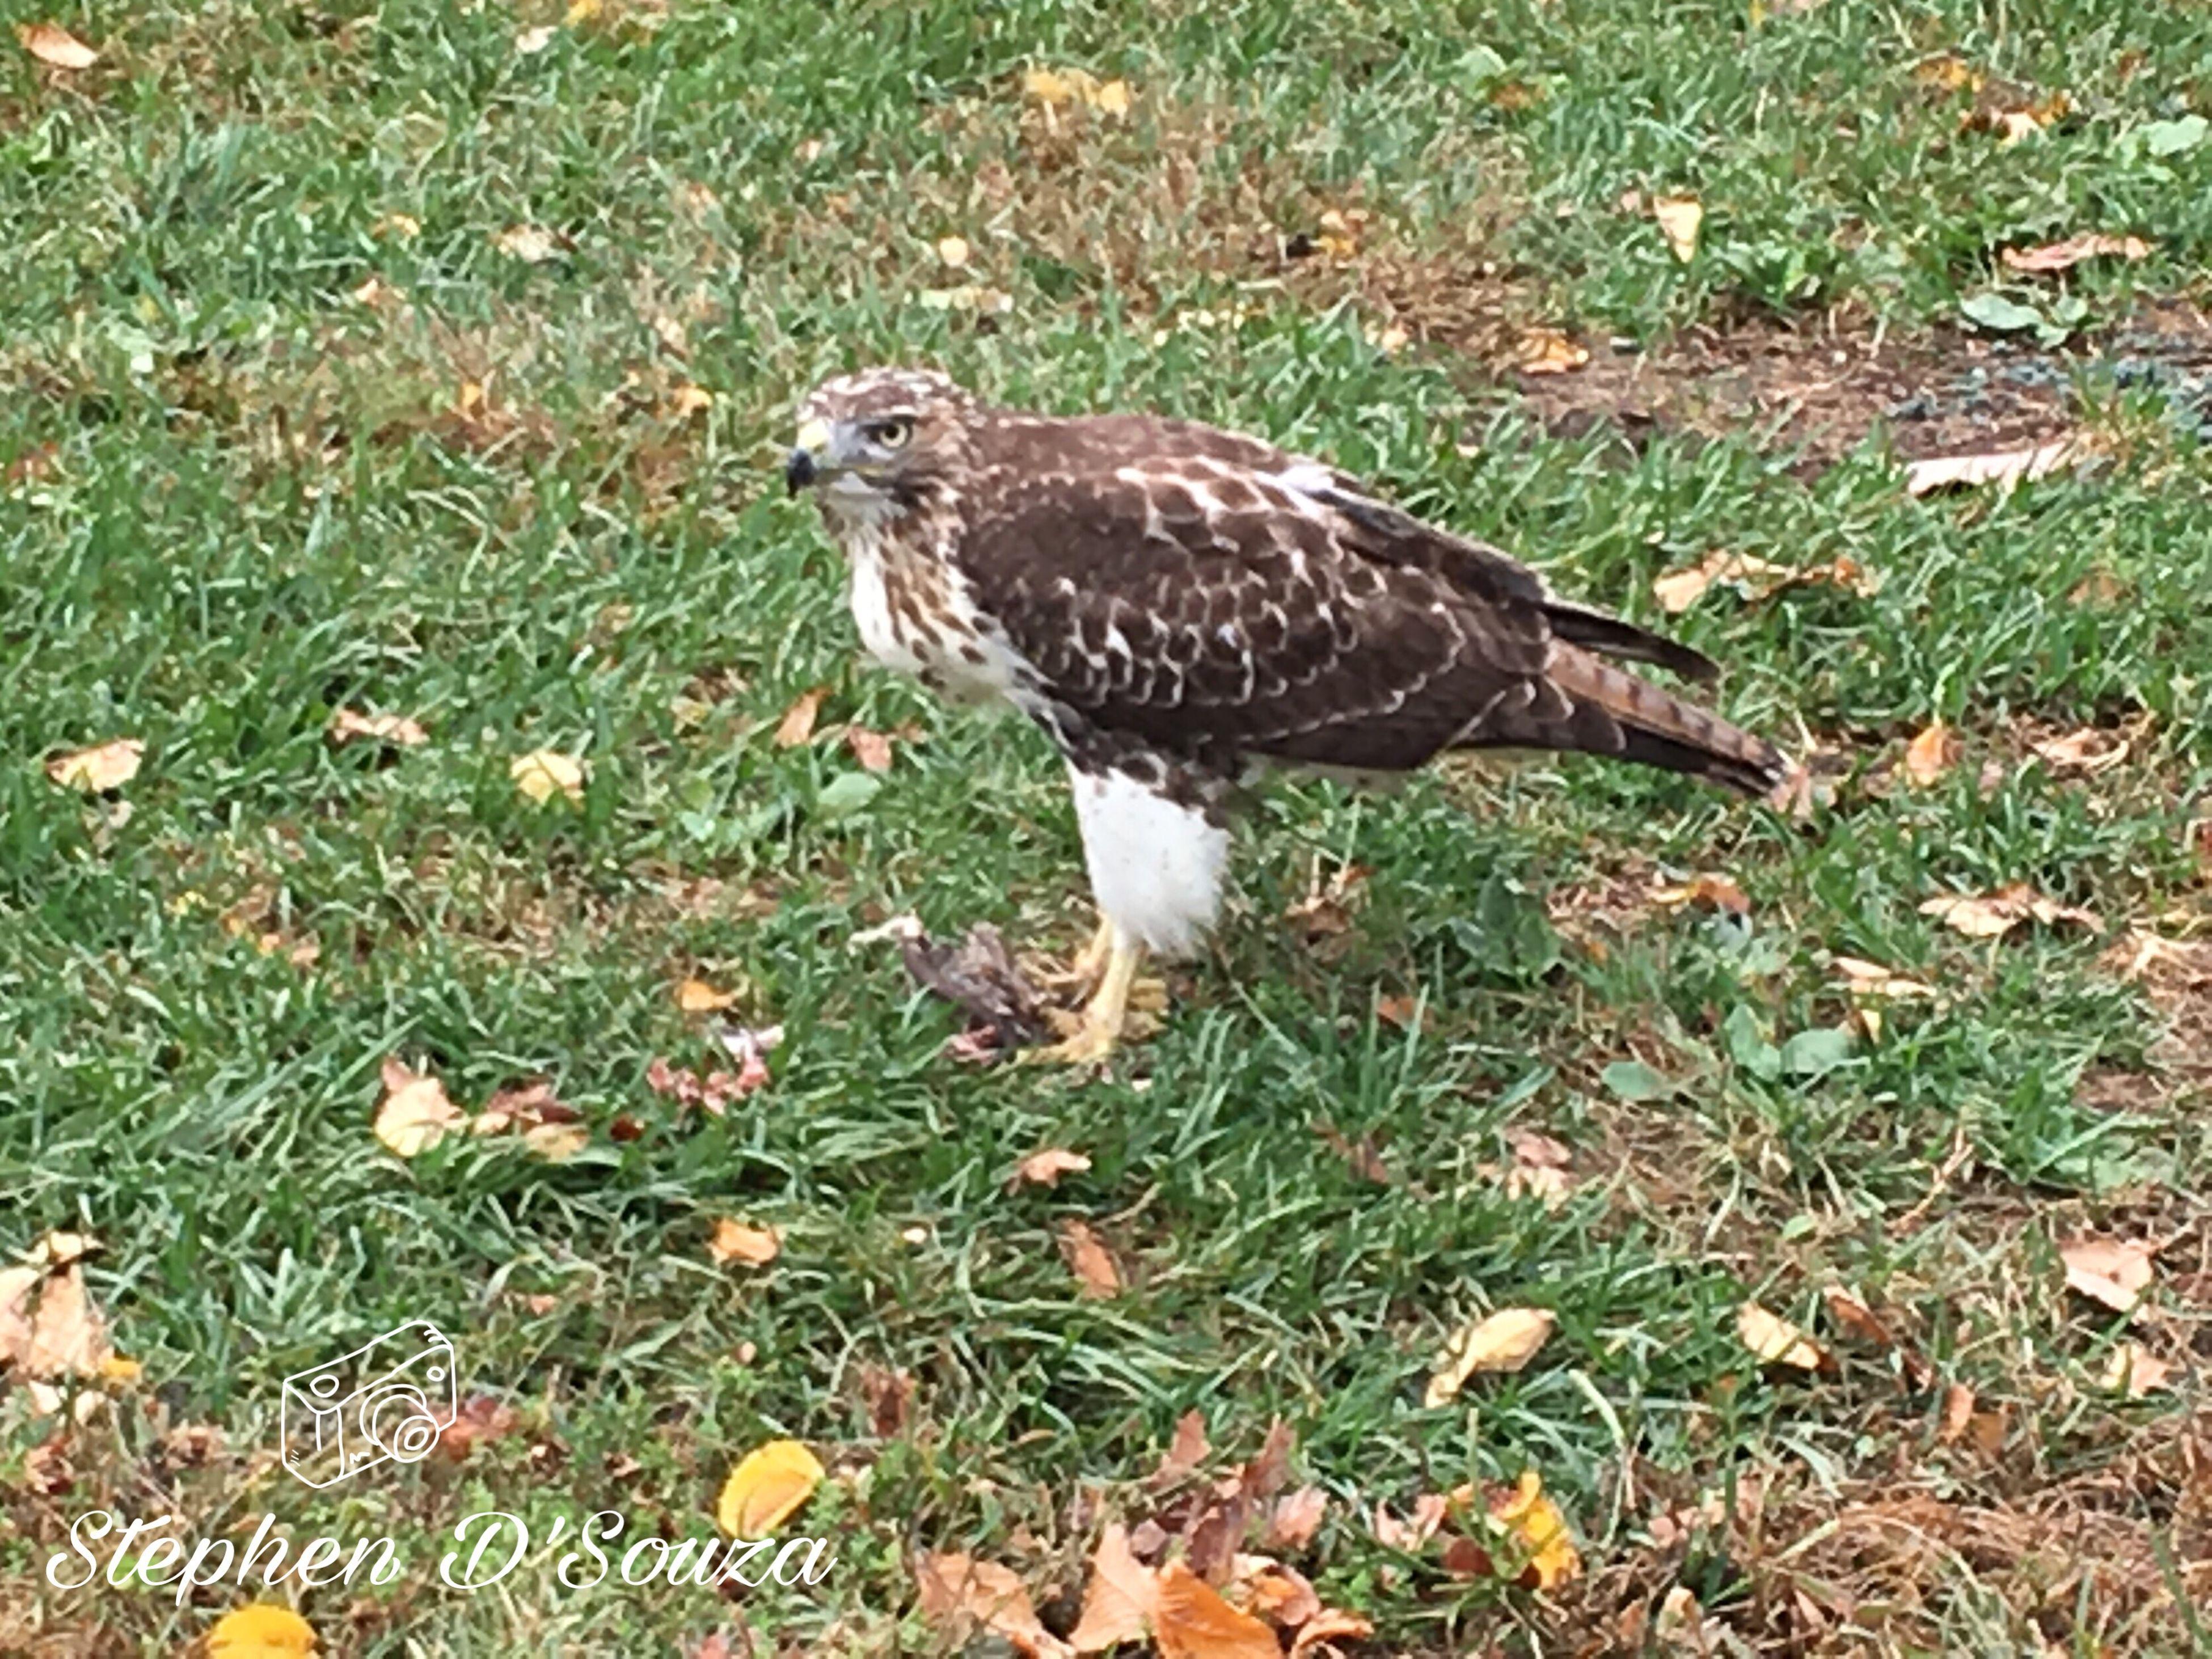 bird, bird of prey, animal themes, grass, one animal, field, nature, no people, animal wildlife, animals in the wild, outdoors, day, hawk, close-up